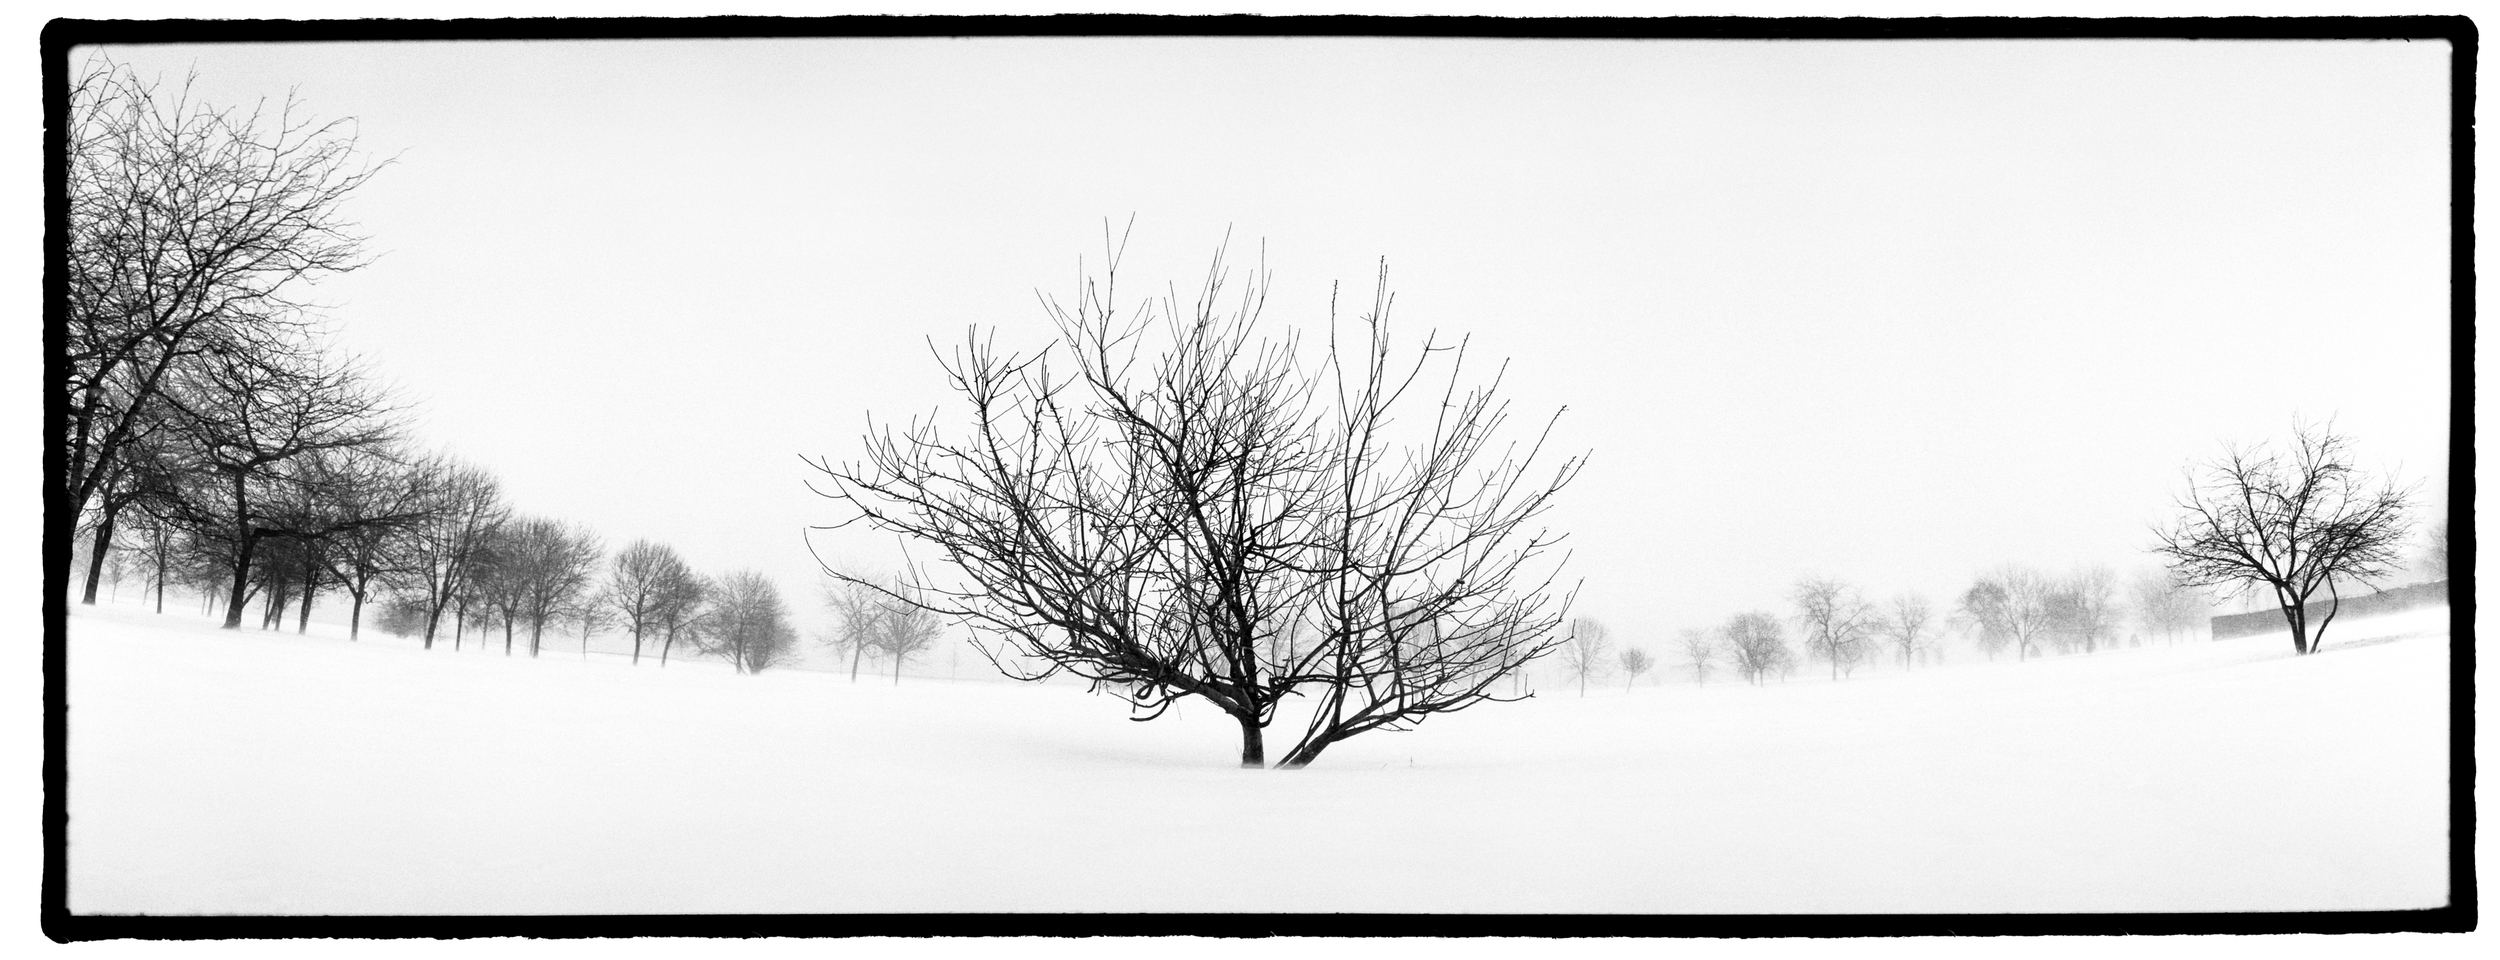 Chicago Snow Printer.jpg